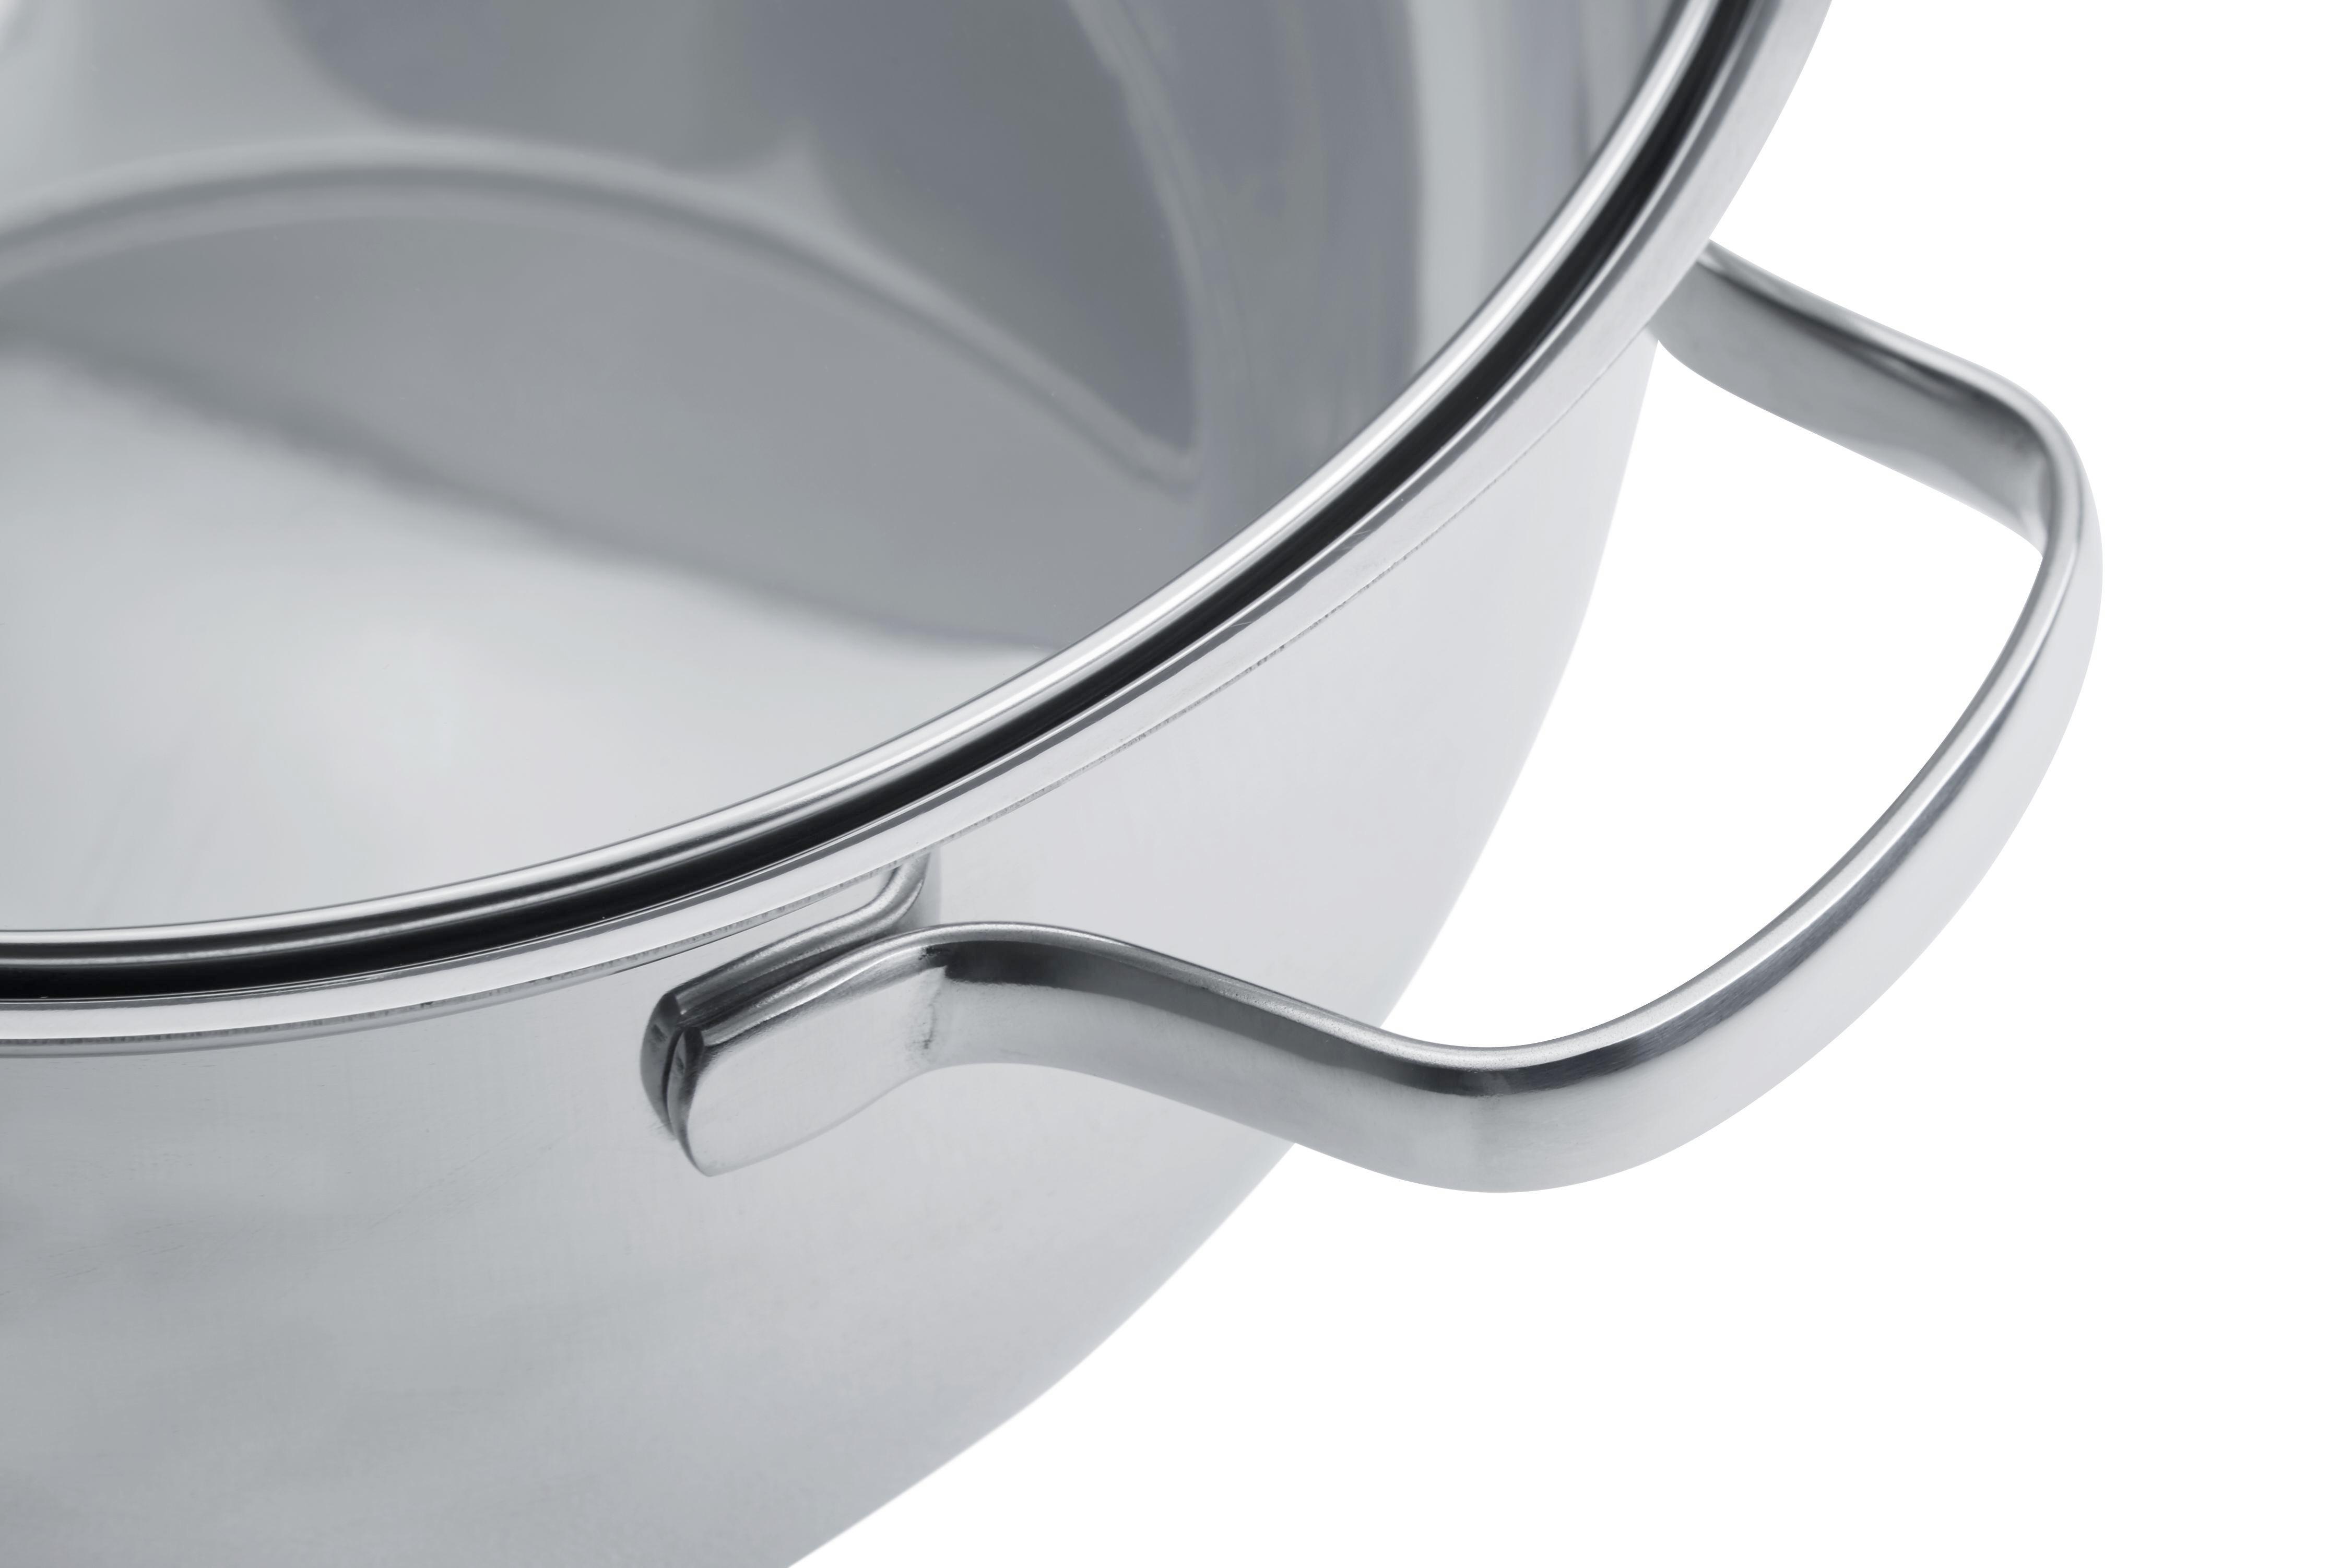 Bräter Rösle - Edelstahlfarben, KONVENTIONELL, Glas/Metall (38/25,5/11,8cm) - RÖSLE